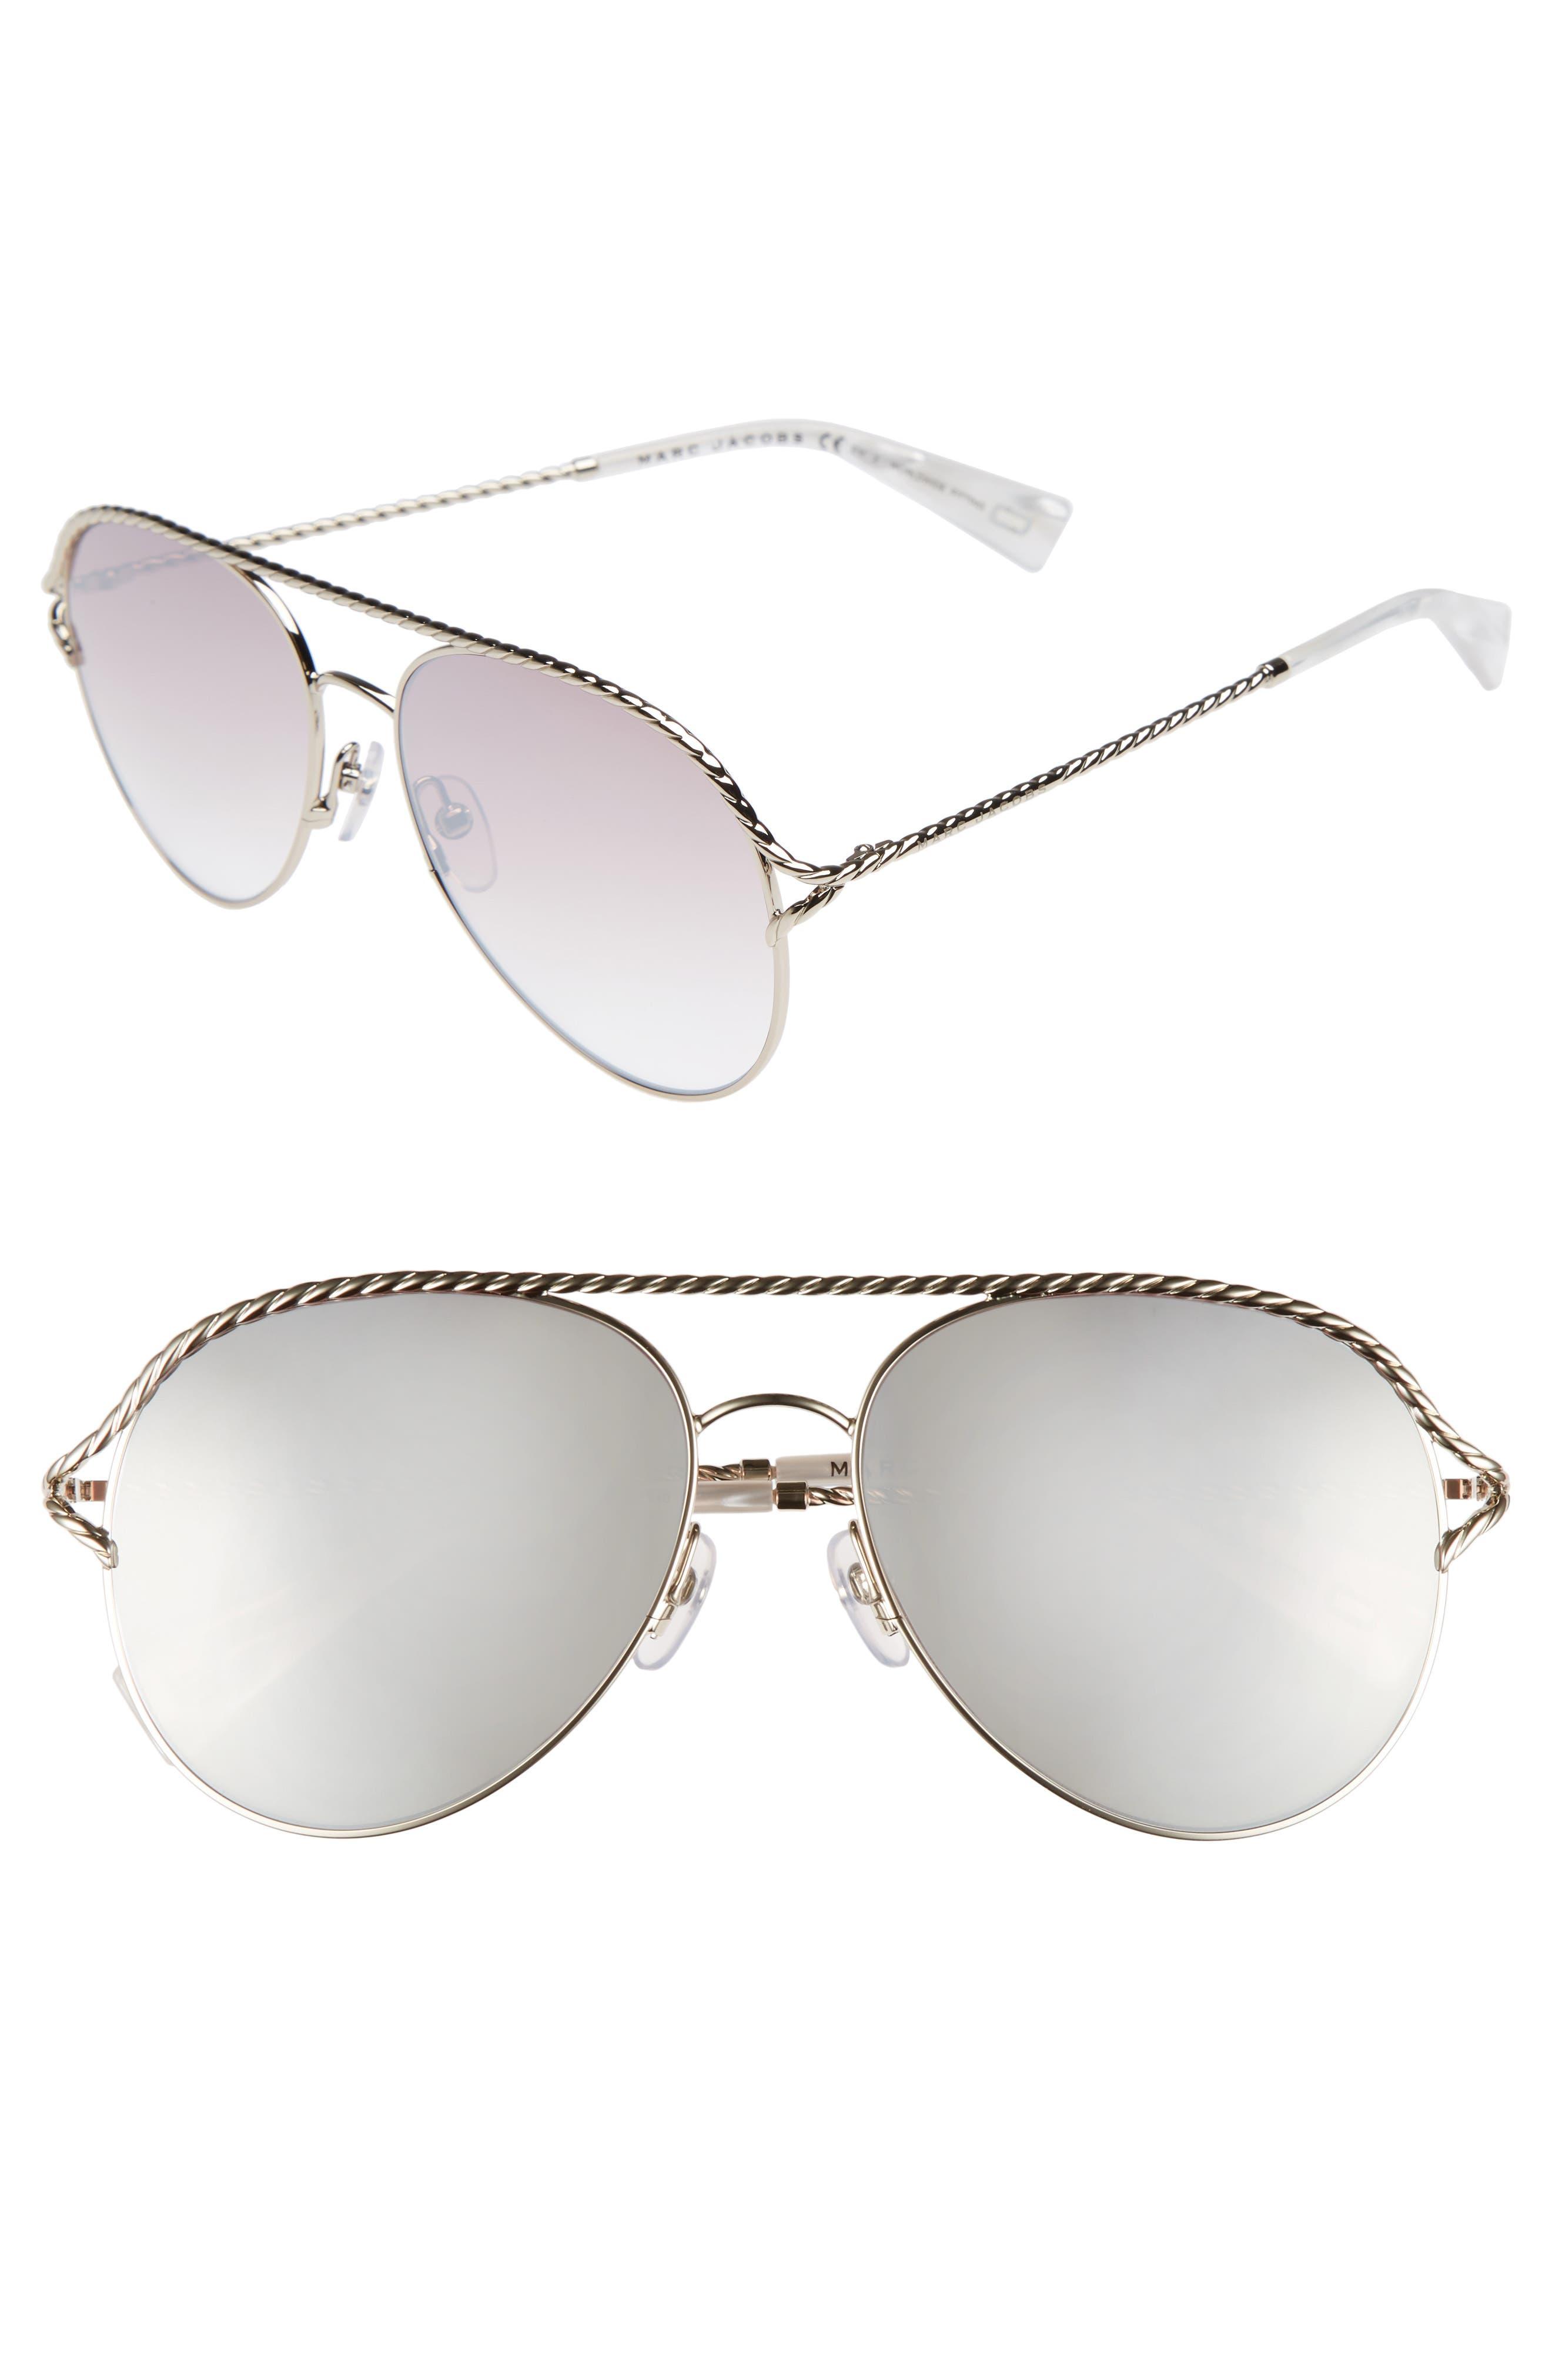 58mm Aviator Sunglasses,                         Main,                         color, 100